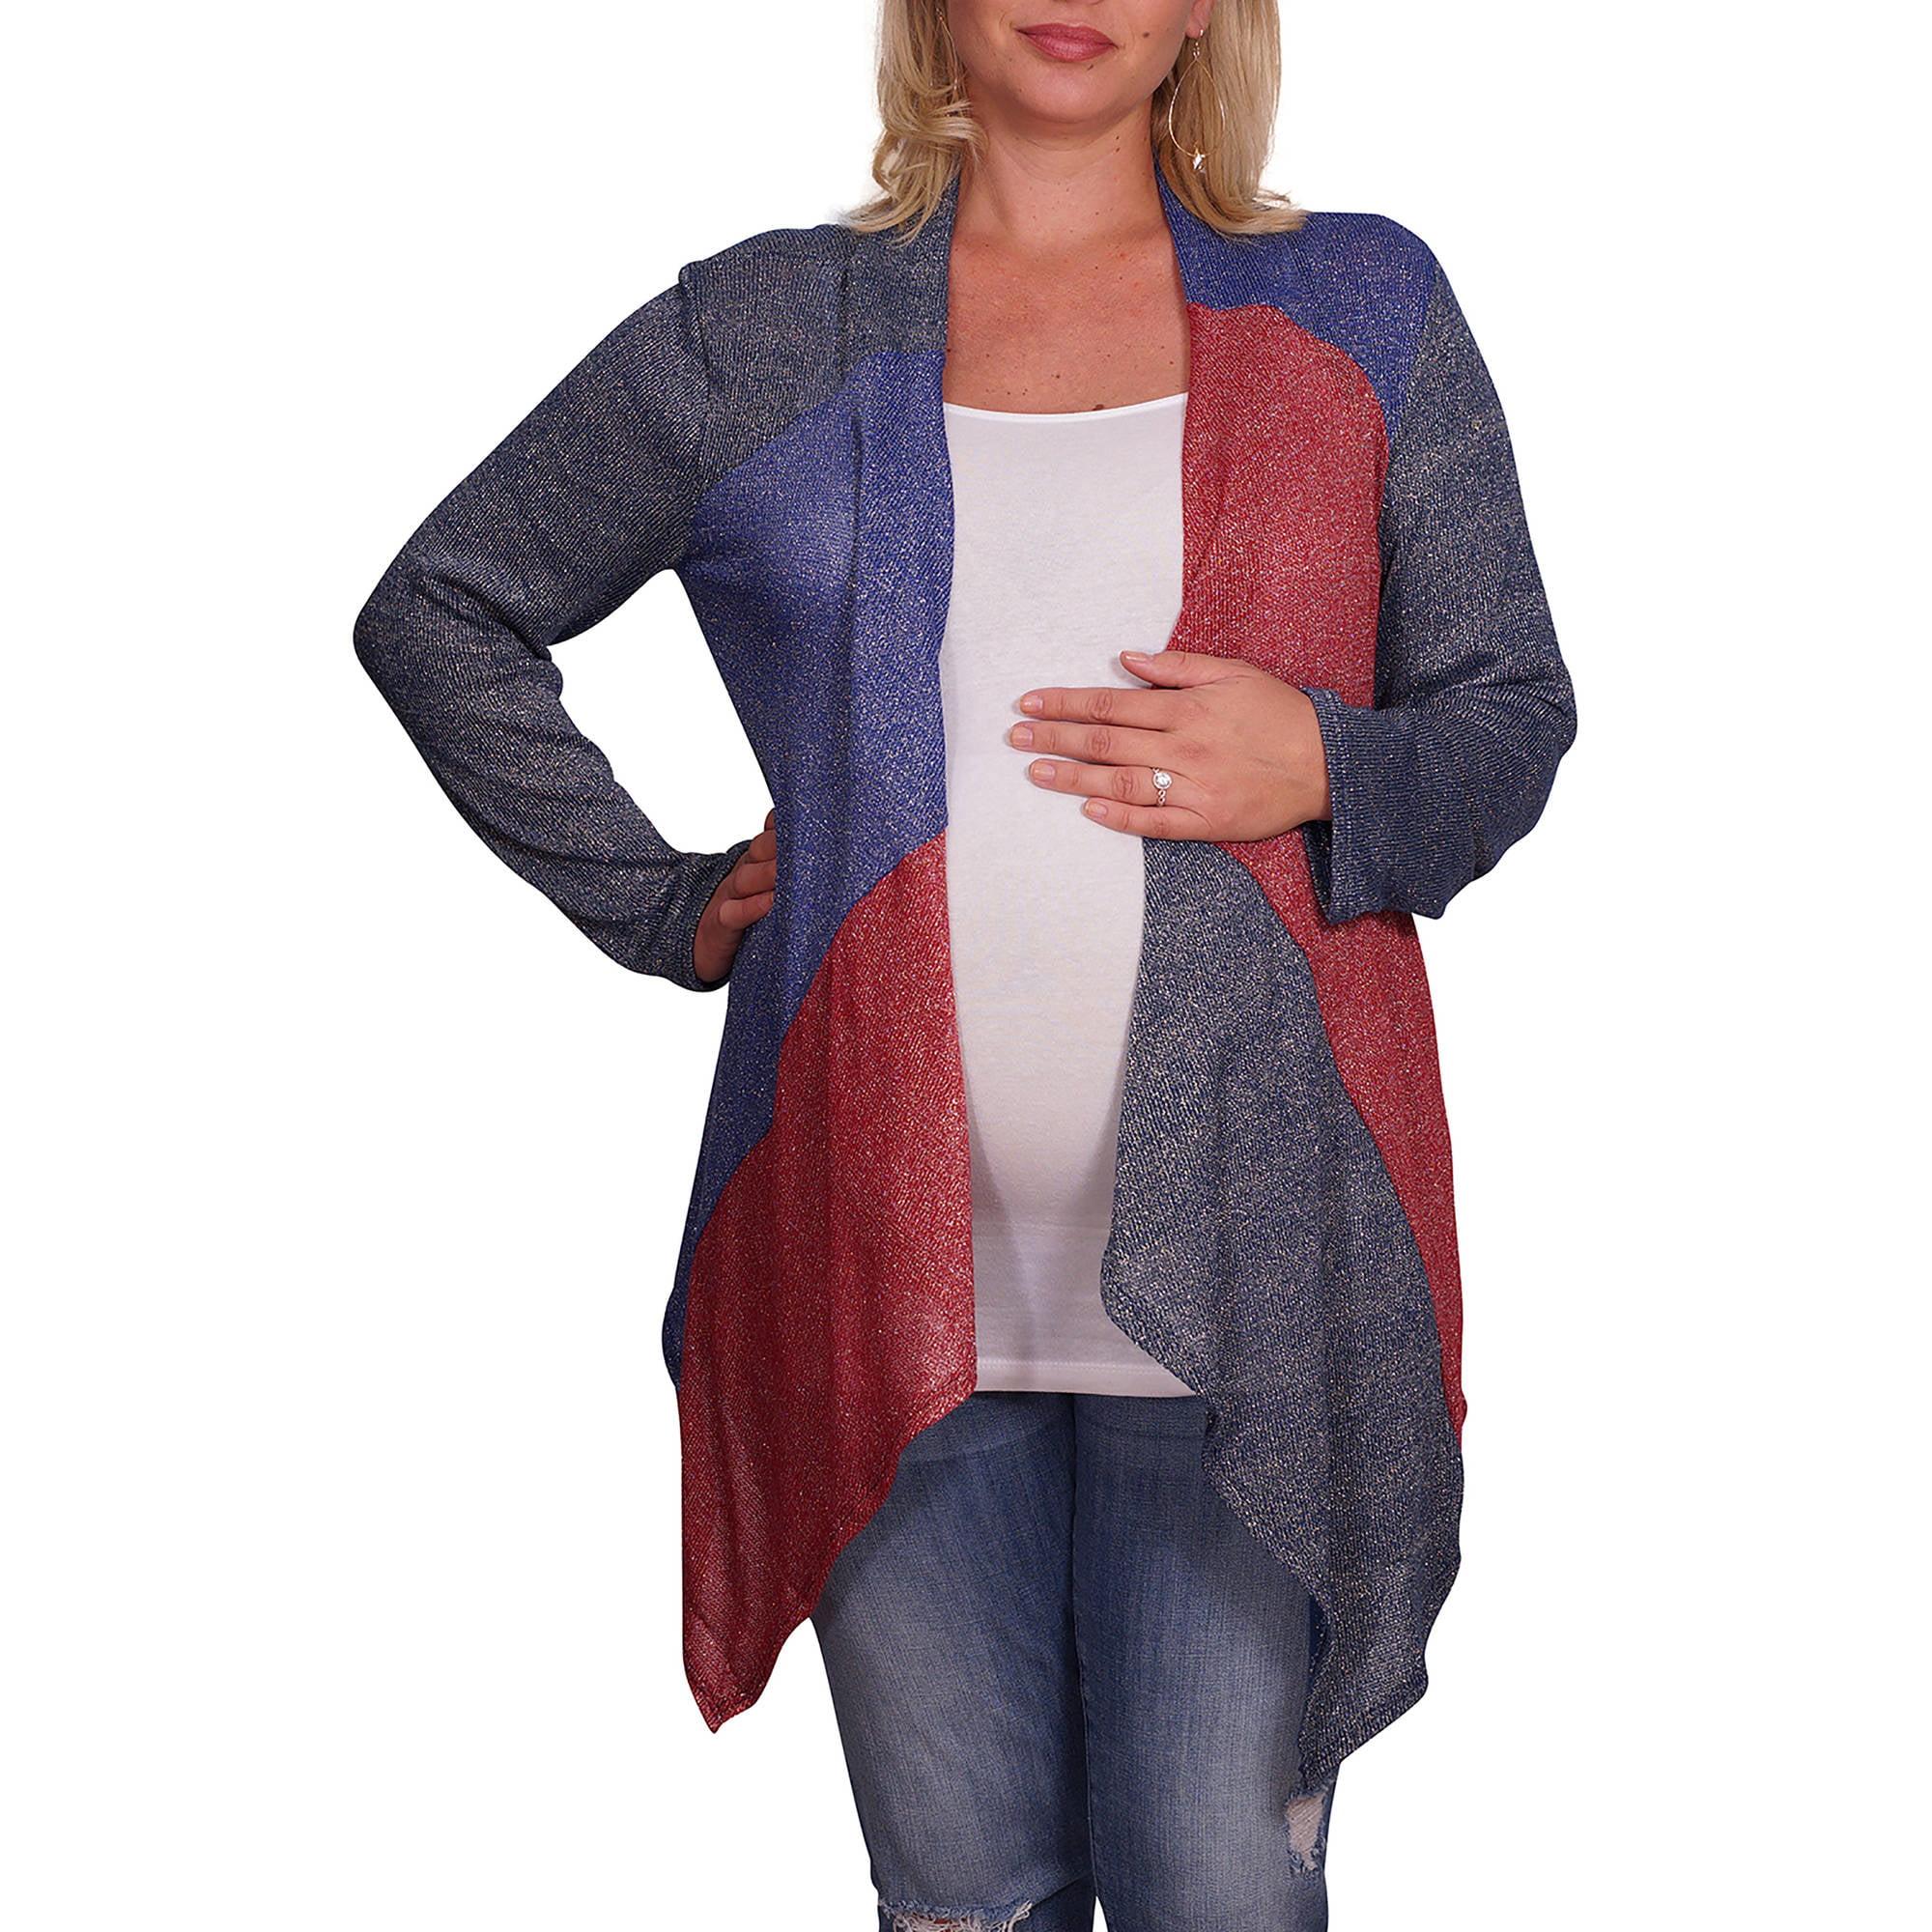 Mommylicious Maternity Plus Maternity Metallic Draped Front Cardigan